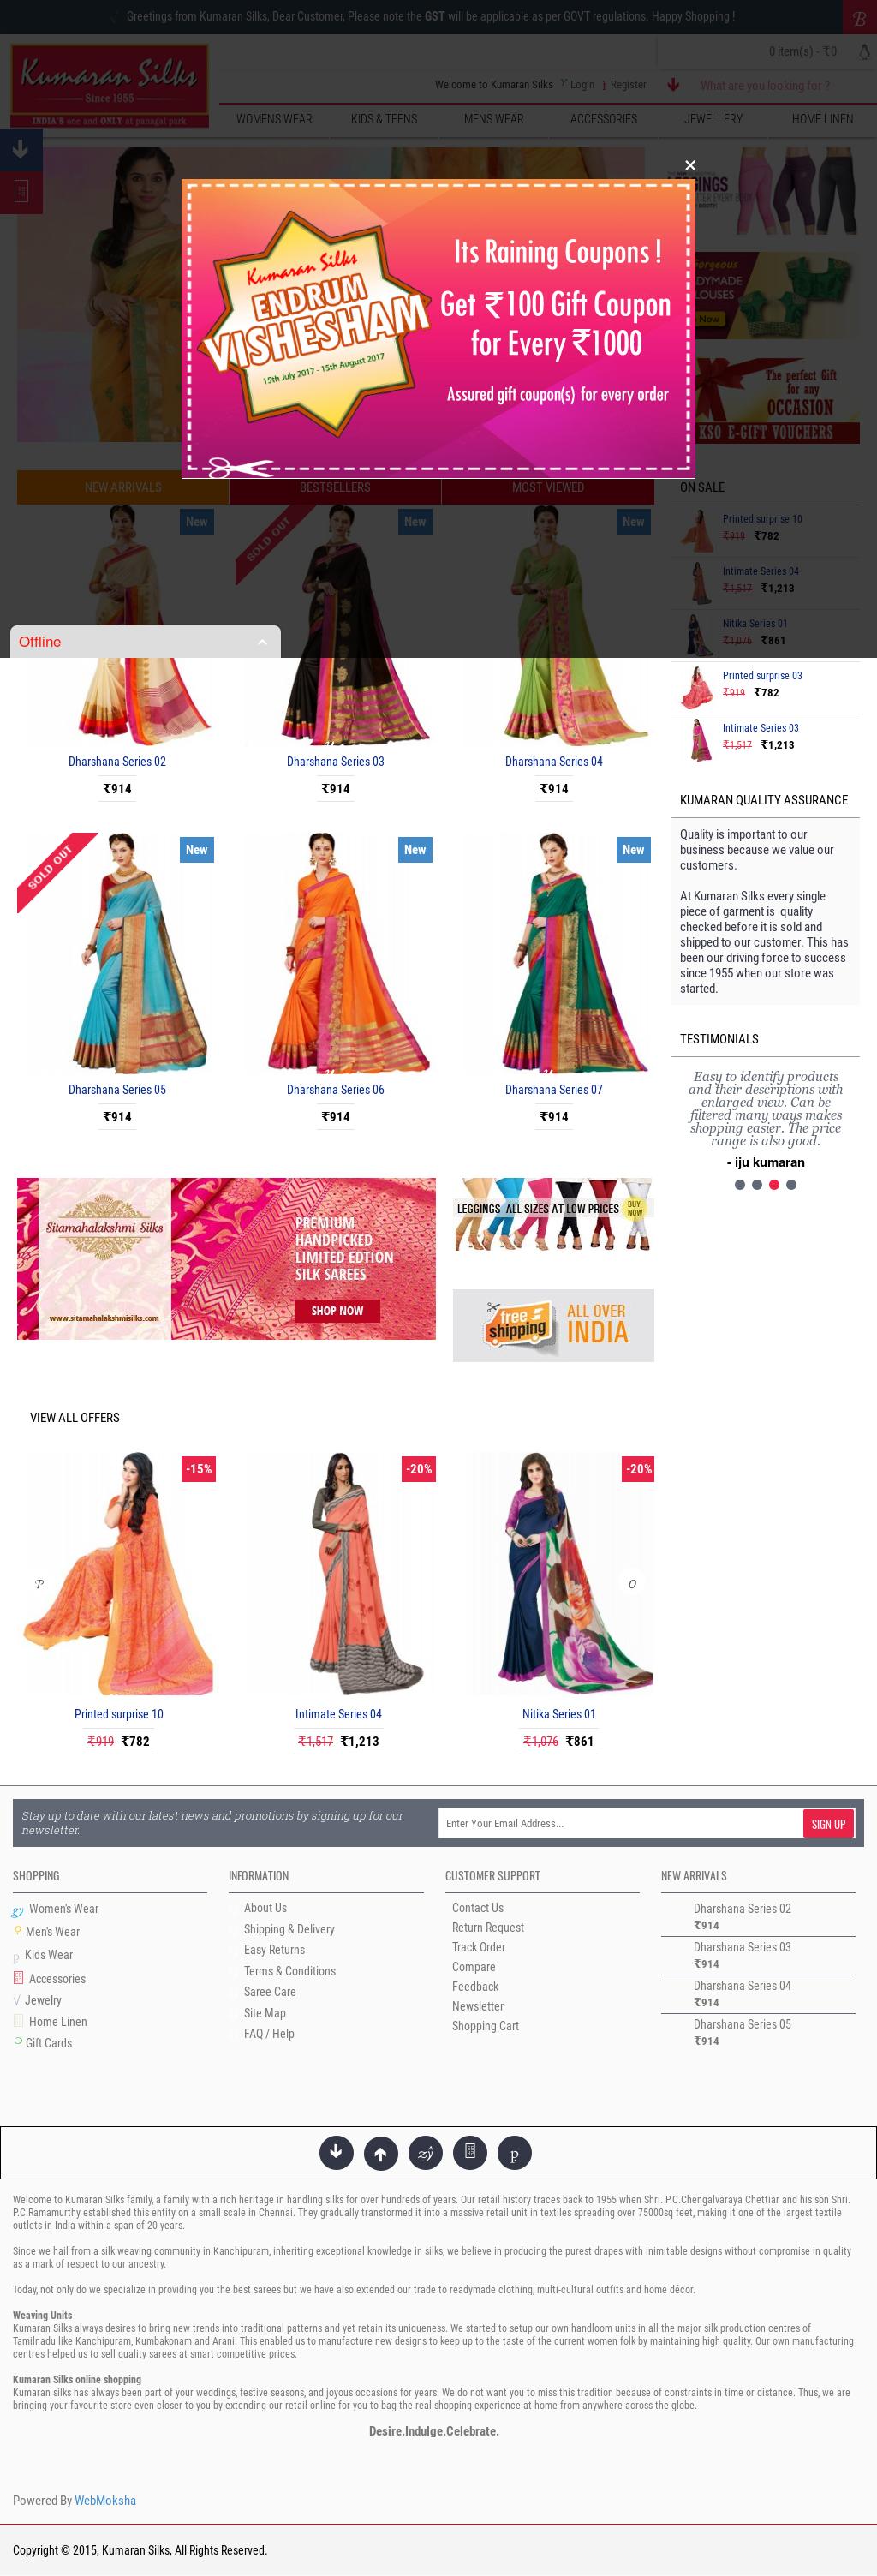 Kumaran Silks Competitors, Revenue and Employees - Owler Company Profile